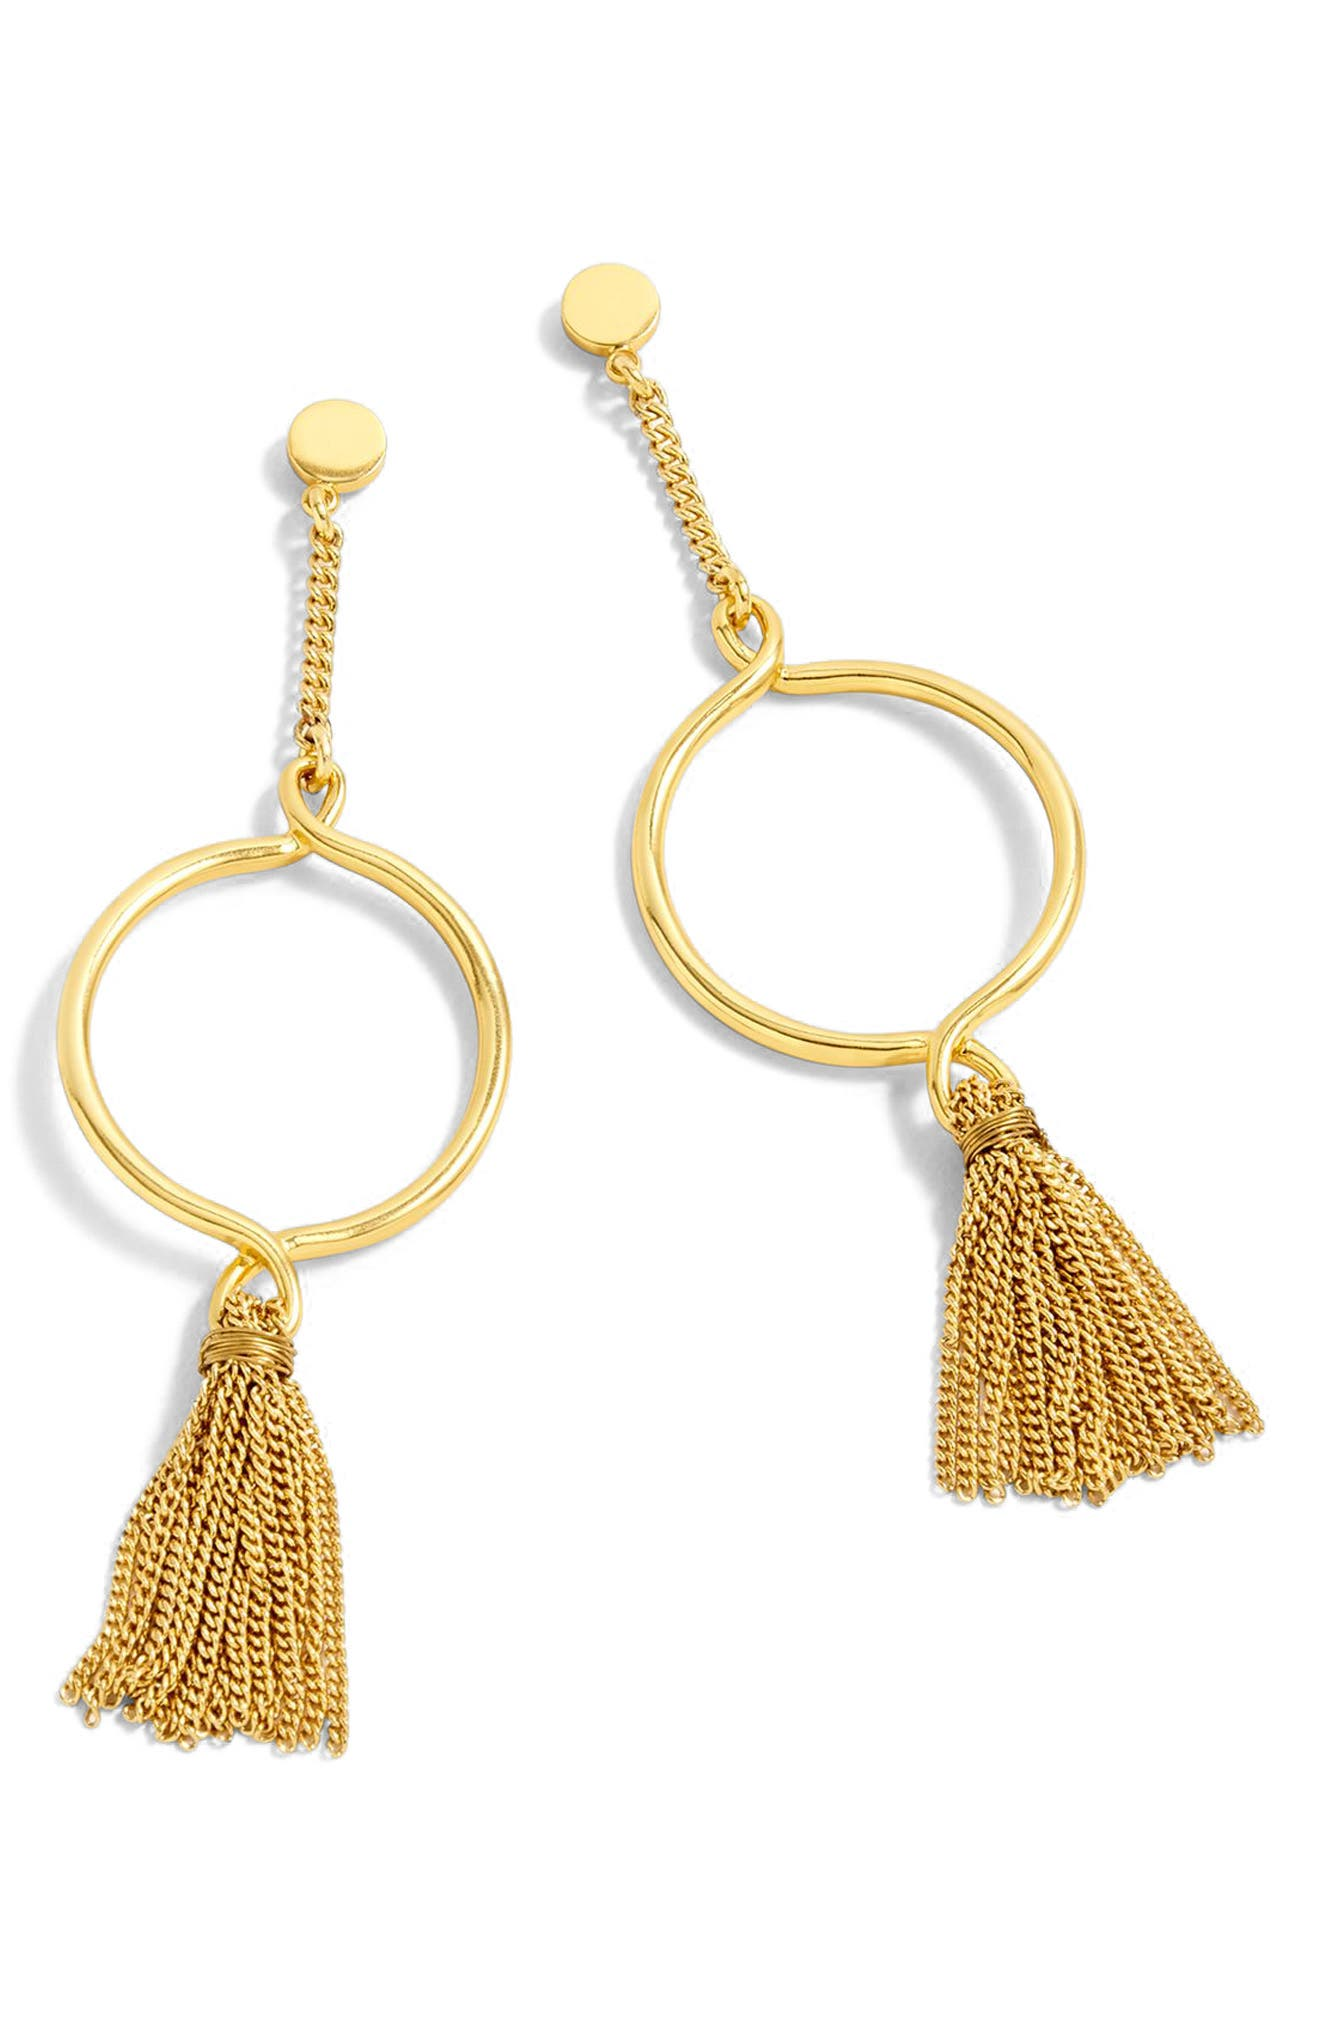 Hanging Hoop Broom Earrings,                             Main thumbnail 1, color,                             Burnished Gold